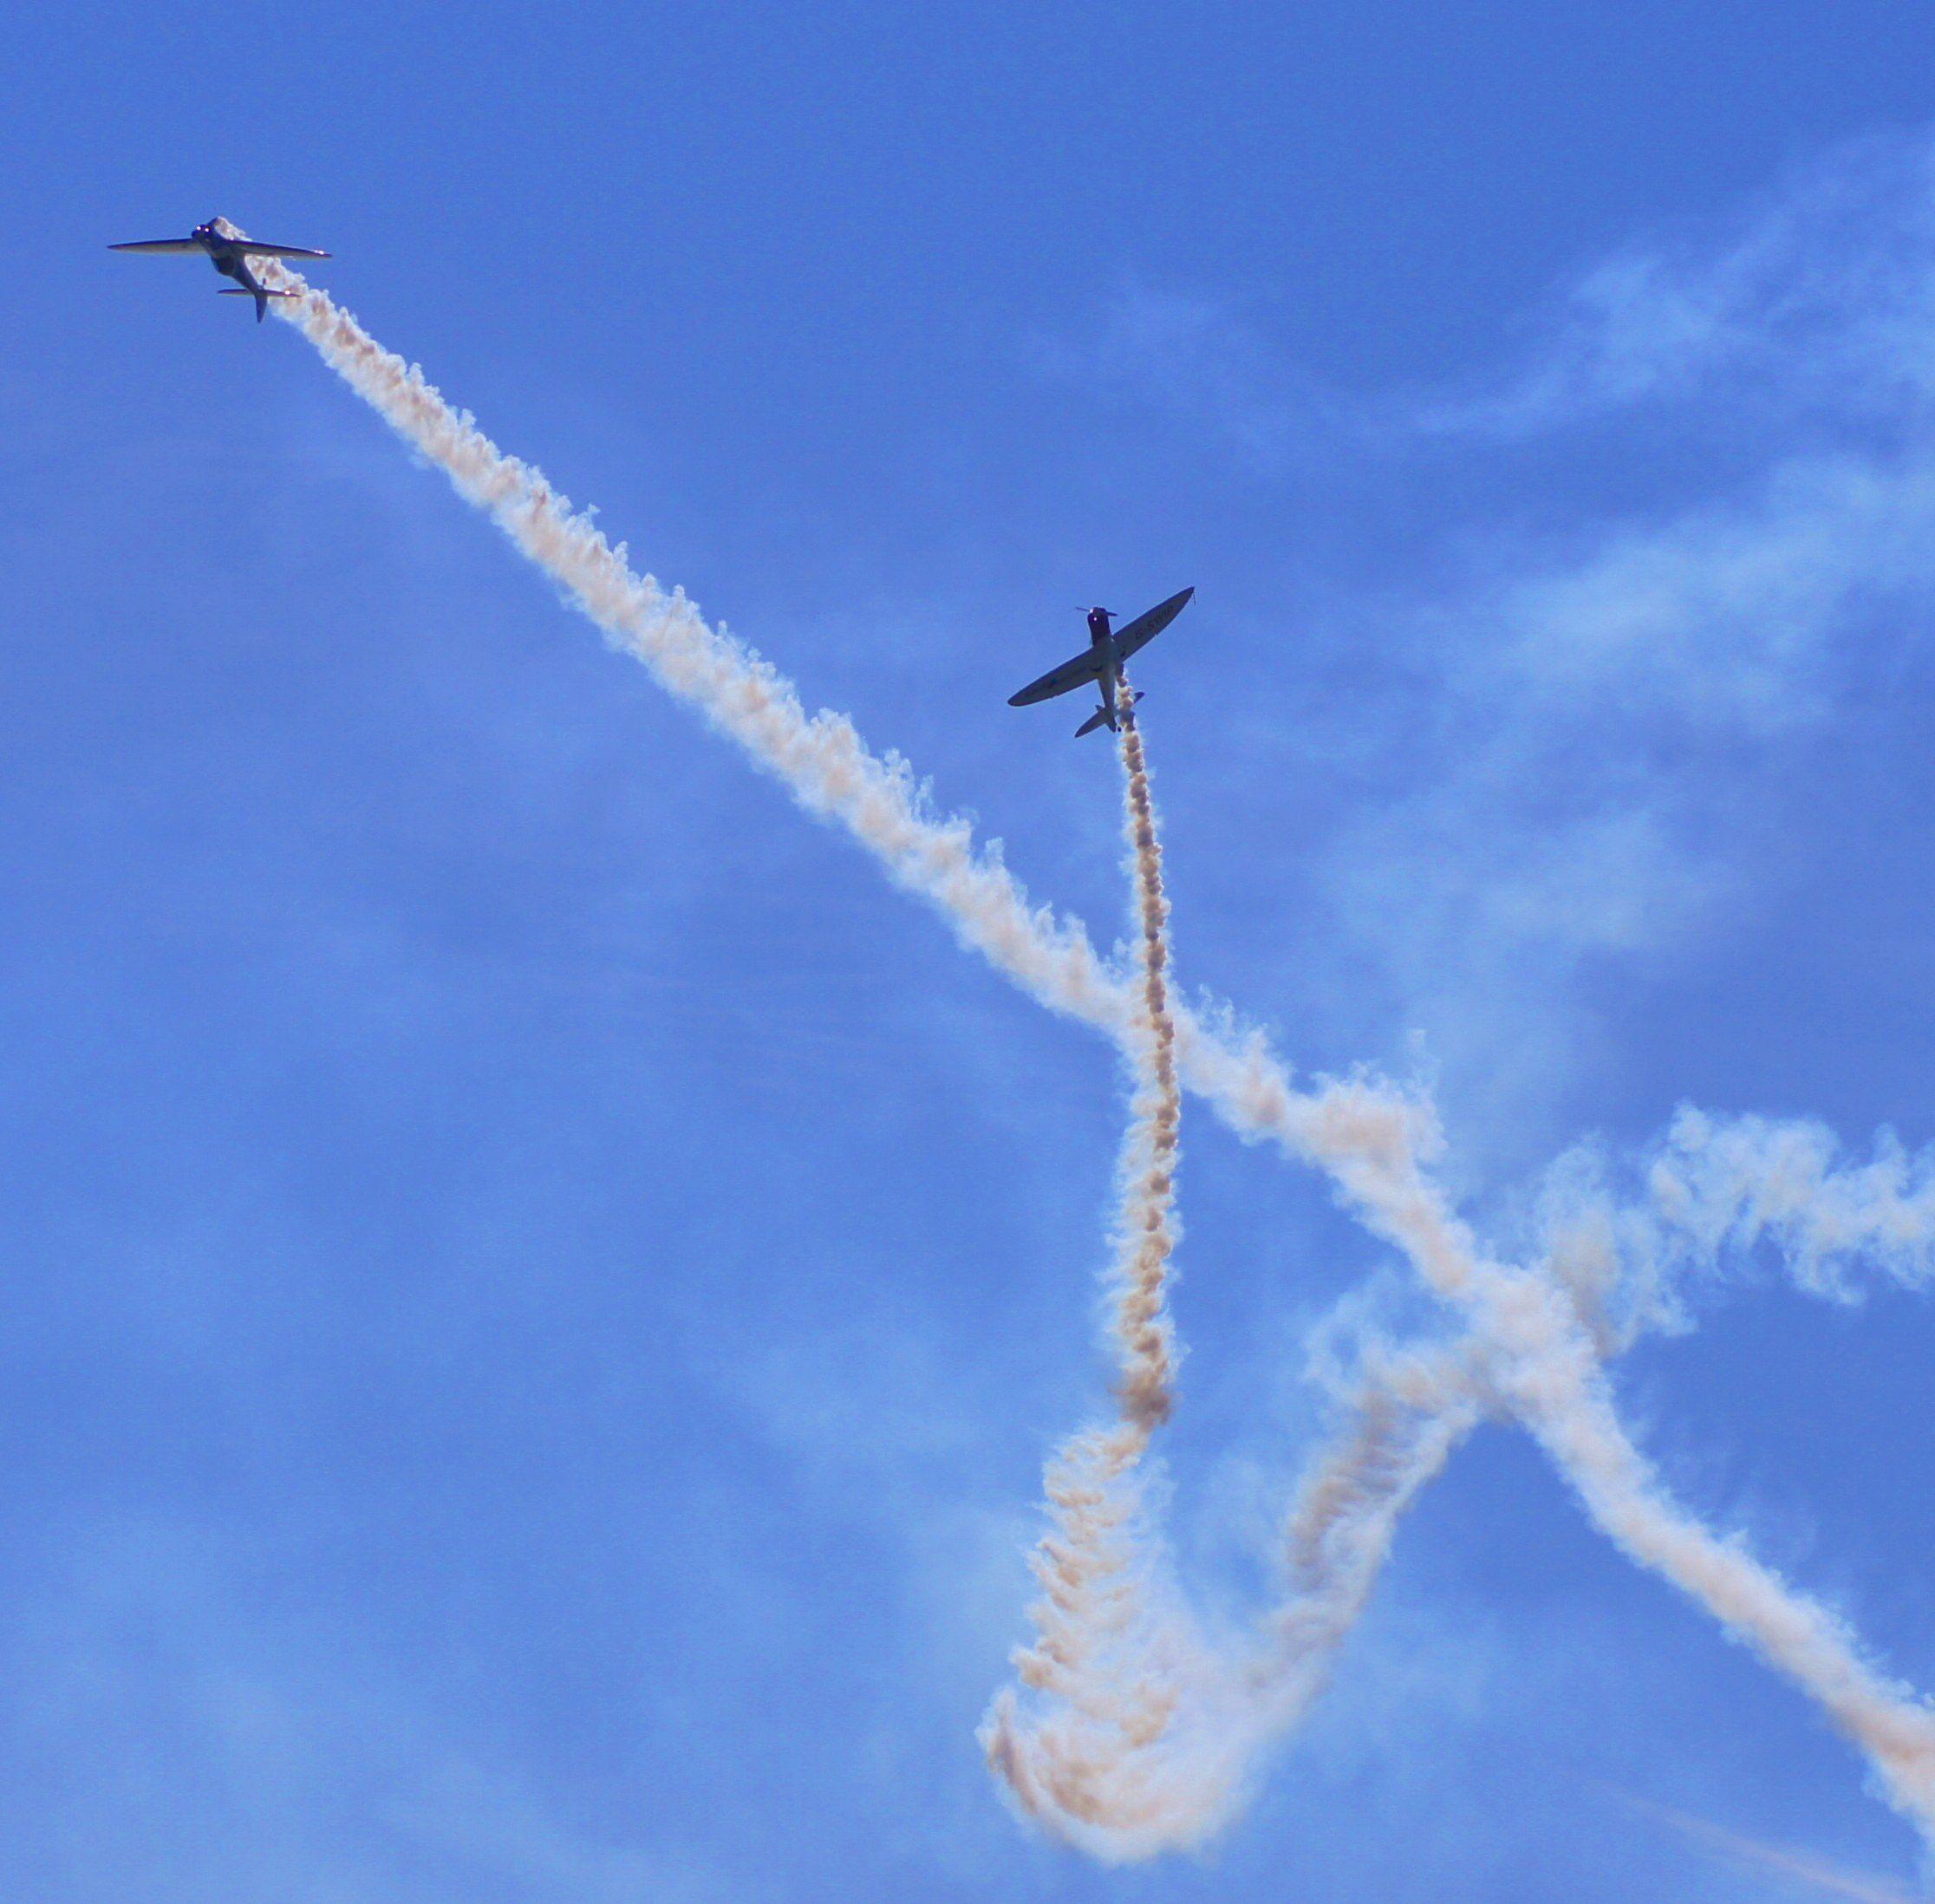 Aerobatics display - Southend airshow